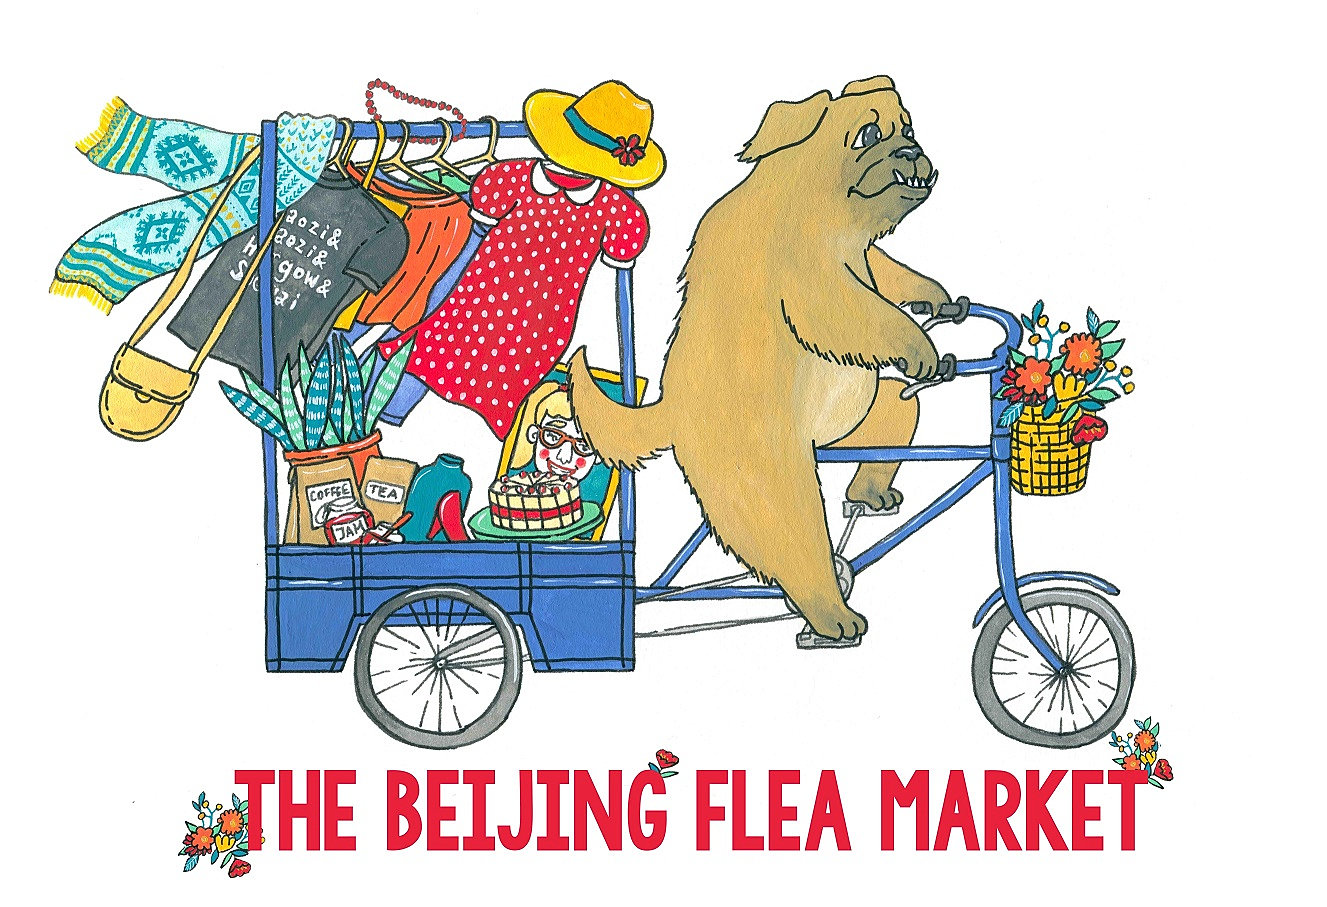 Liuba Draws Illustrations | The Beijing Flea Market Brand Identi